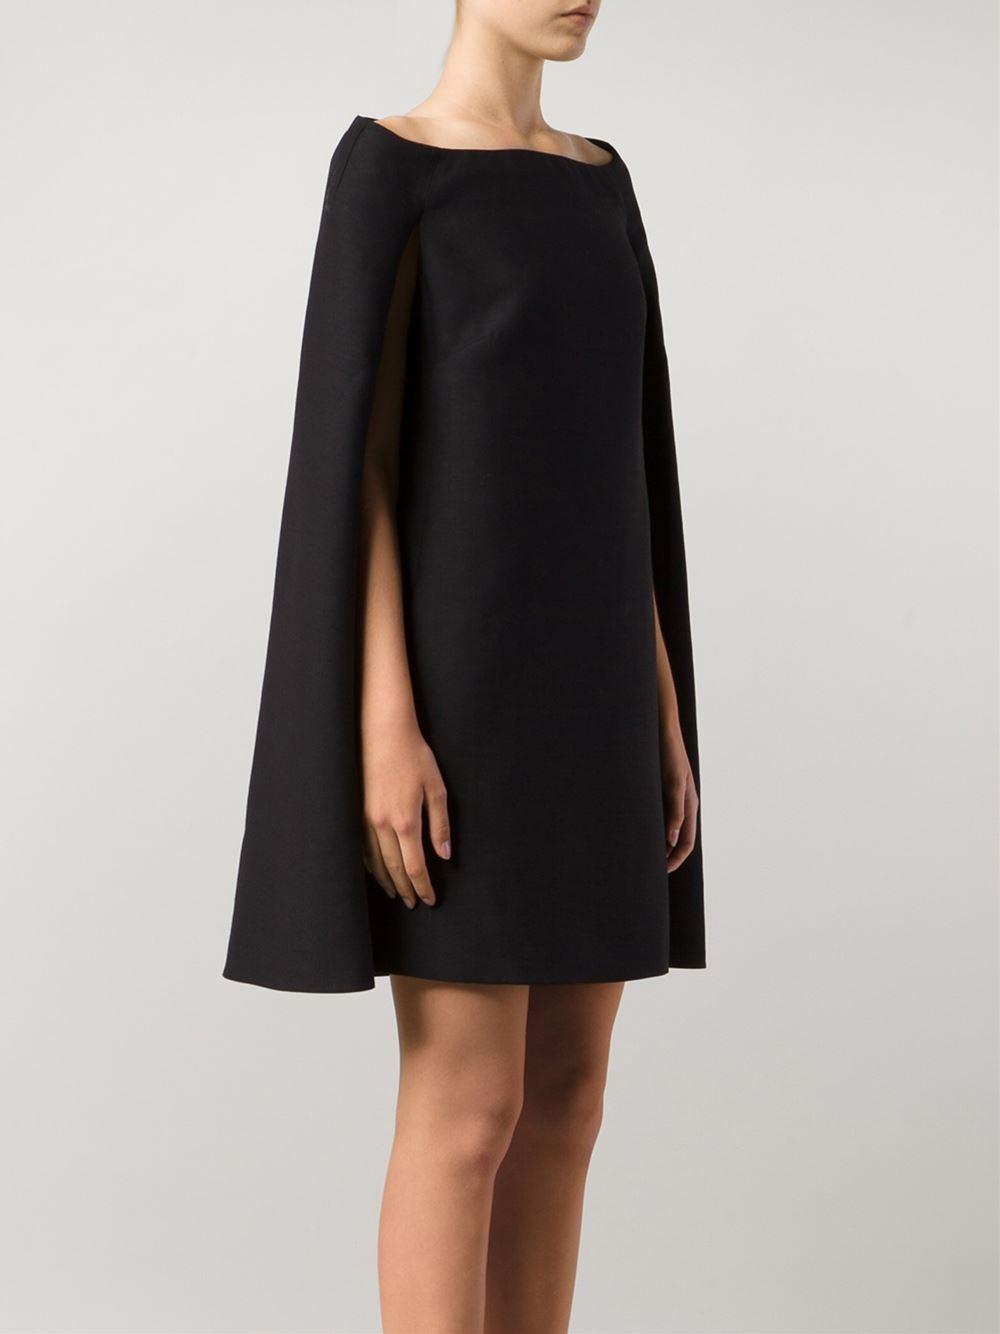 Lyst Valentino Cape Dress In Black